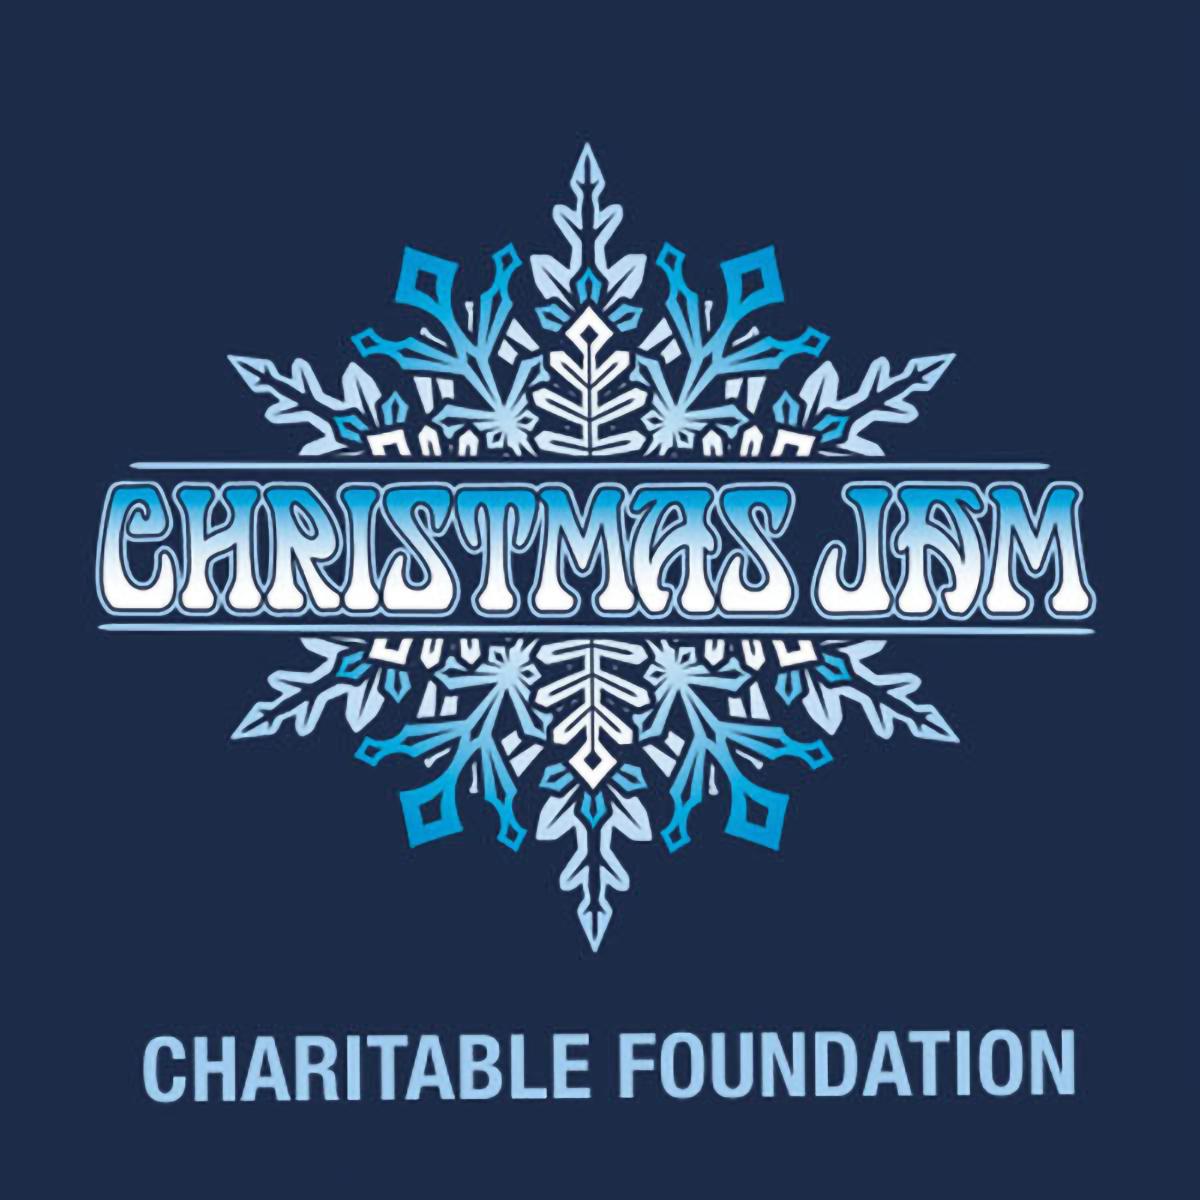 Donation to the Warren Haynes Christmas Jam W&S Charitable Foundation